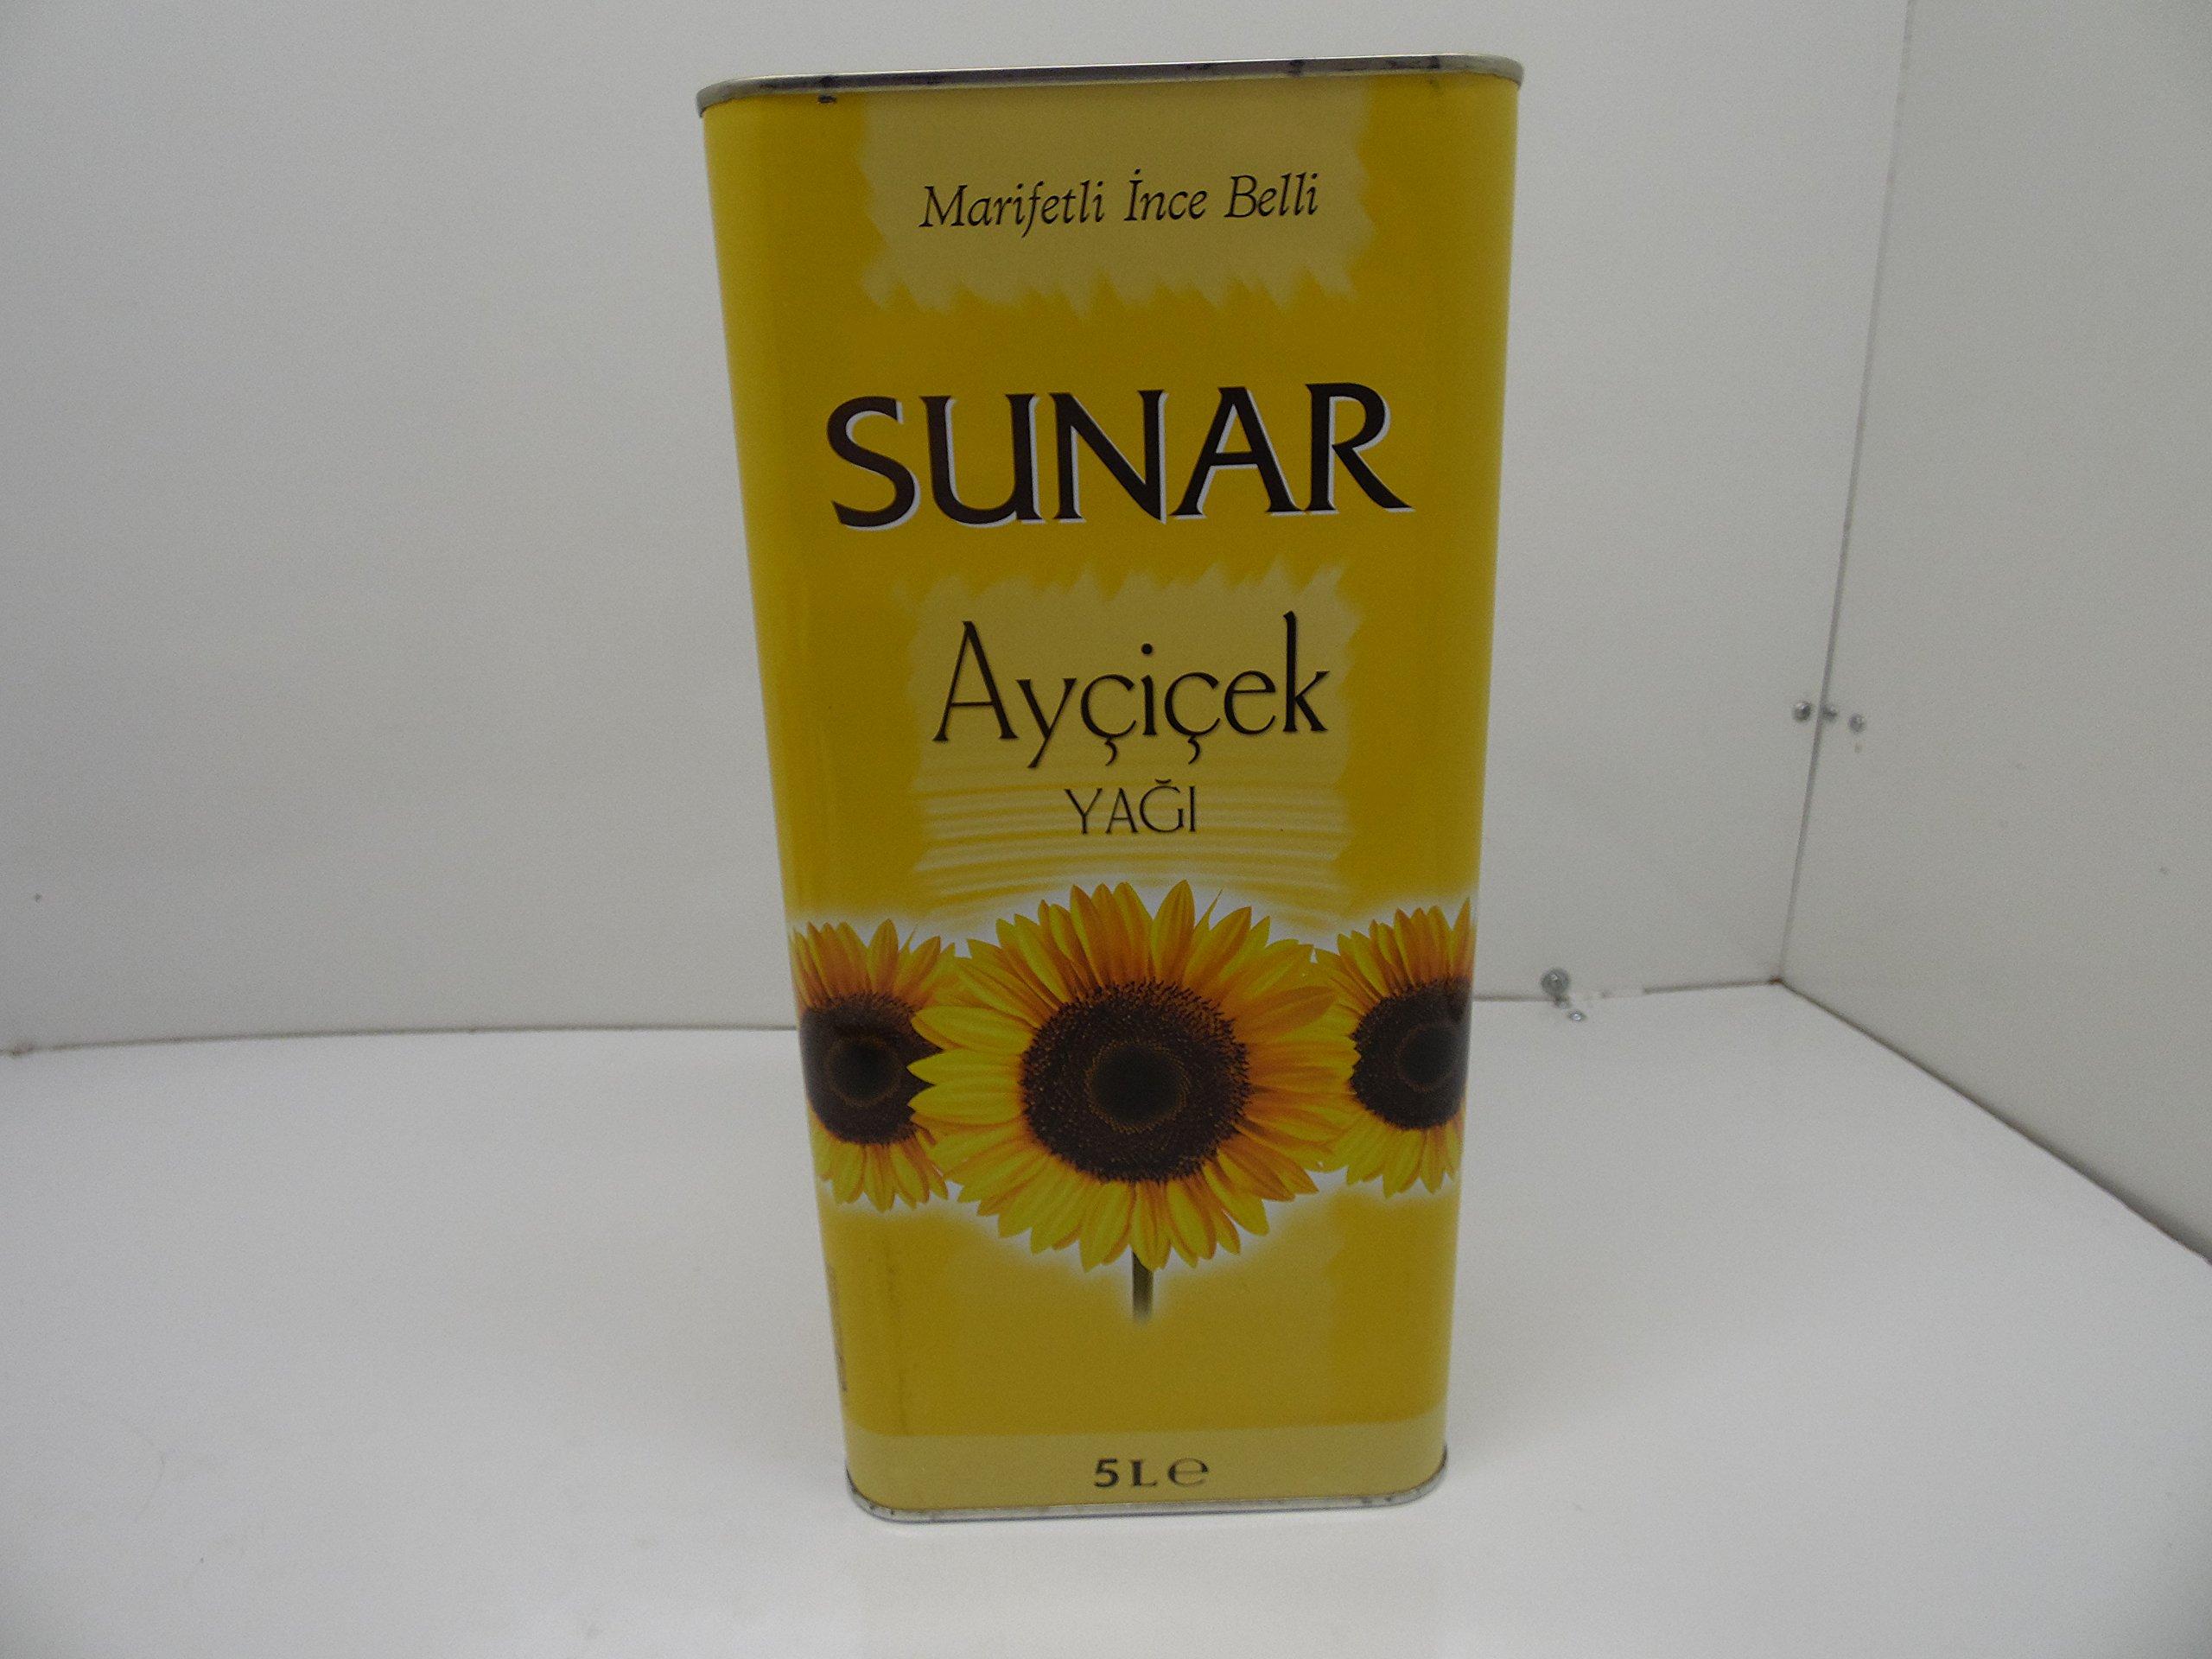 Sunar Turkish Sunflower Oil 5 lt (169 oz)